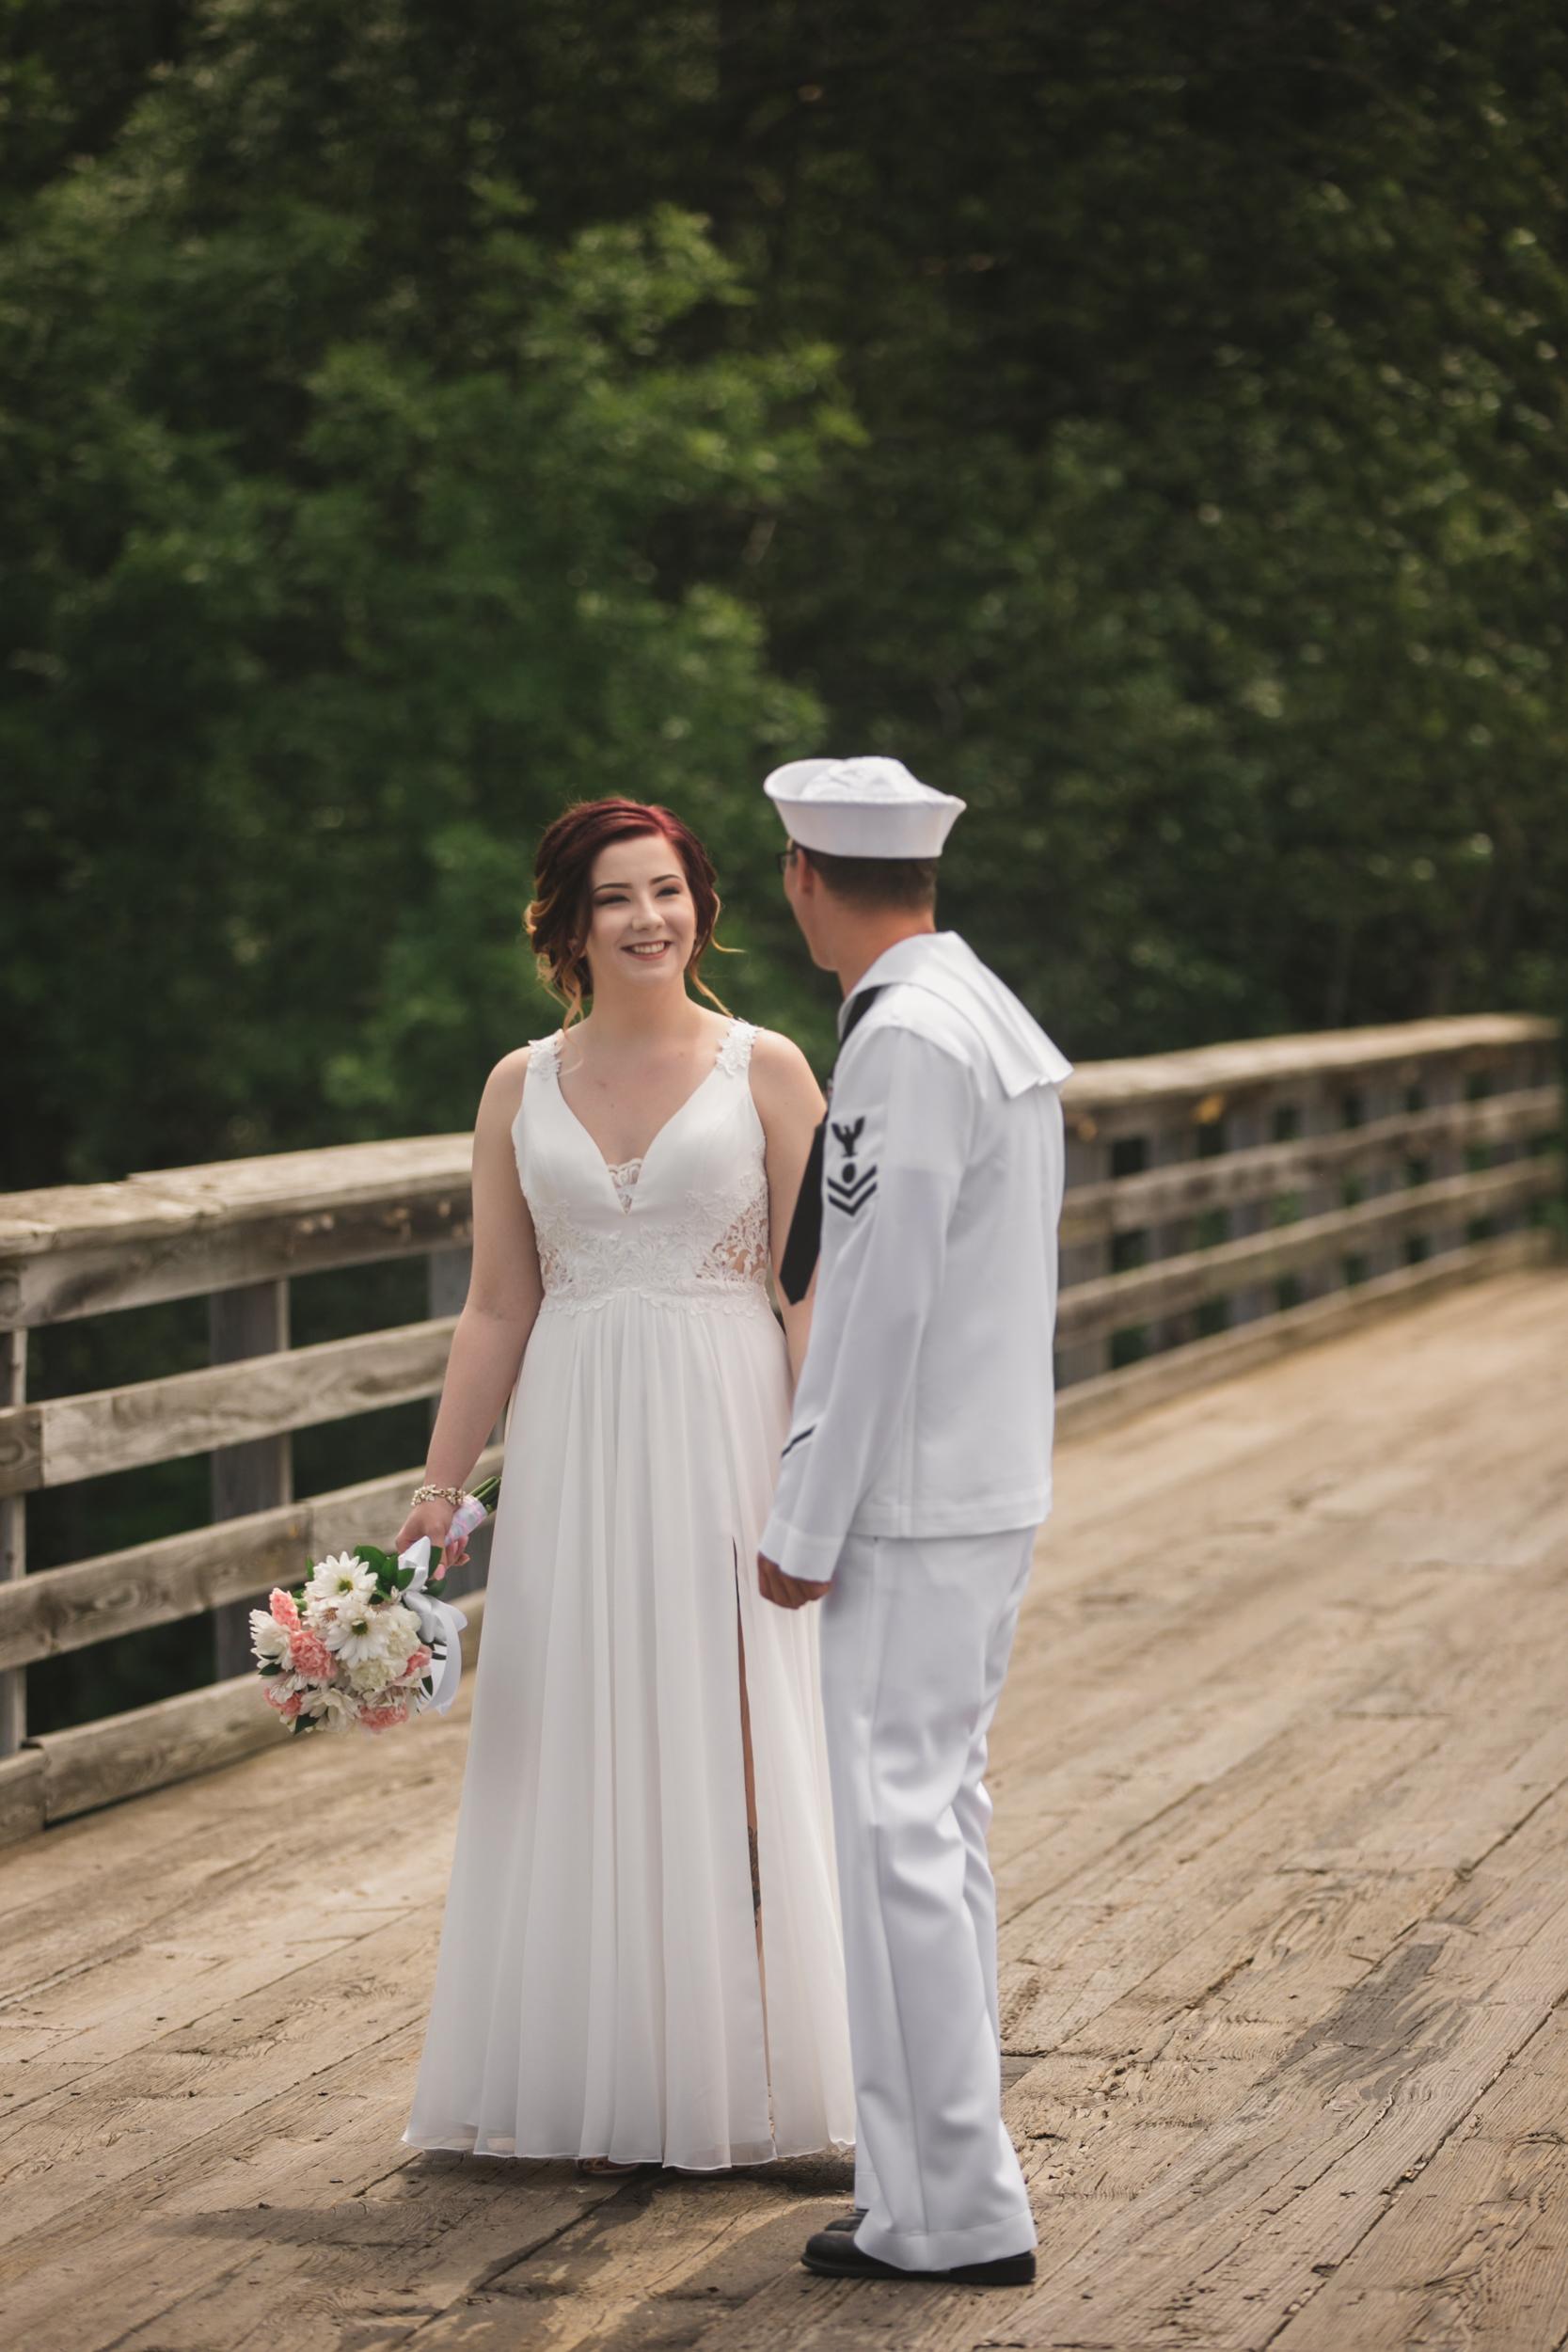 intimate elopement wedding, duluth mn, duluth mn elopement wedding, -www.rachelsmak.com13.jpg